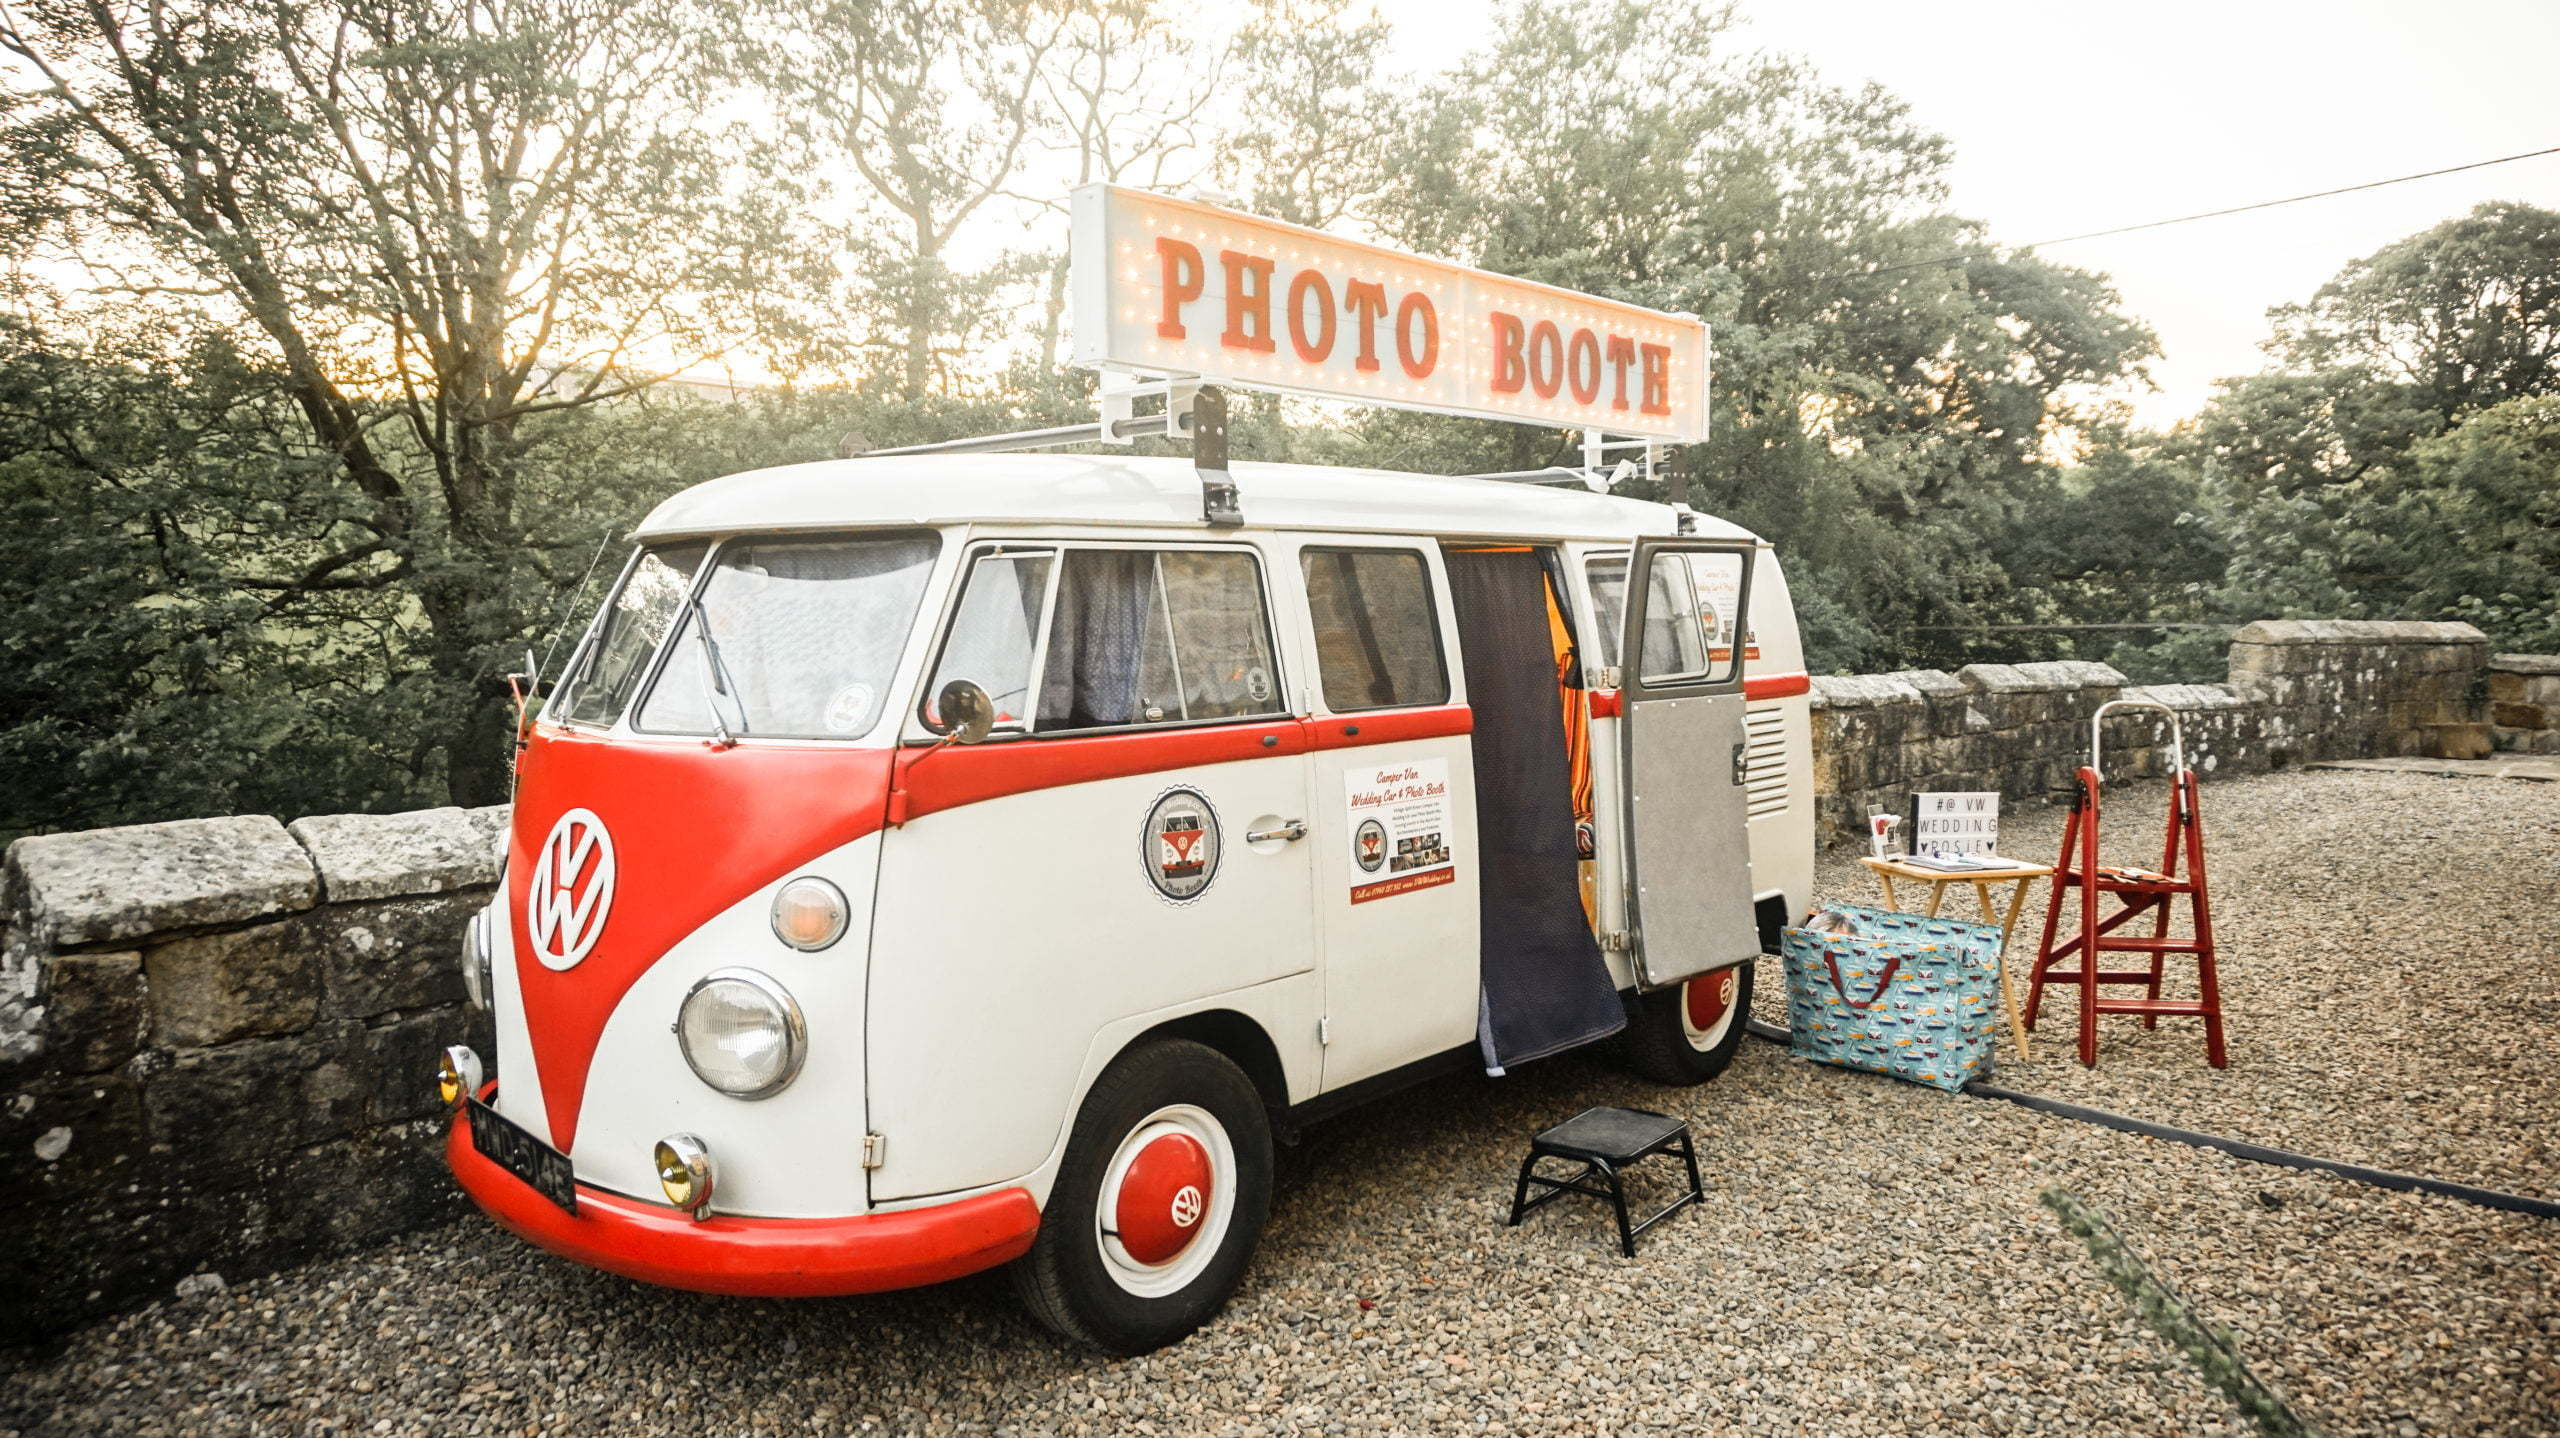 VW Campervan Photo Booth at Brinkburn Northumberland